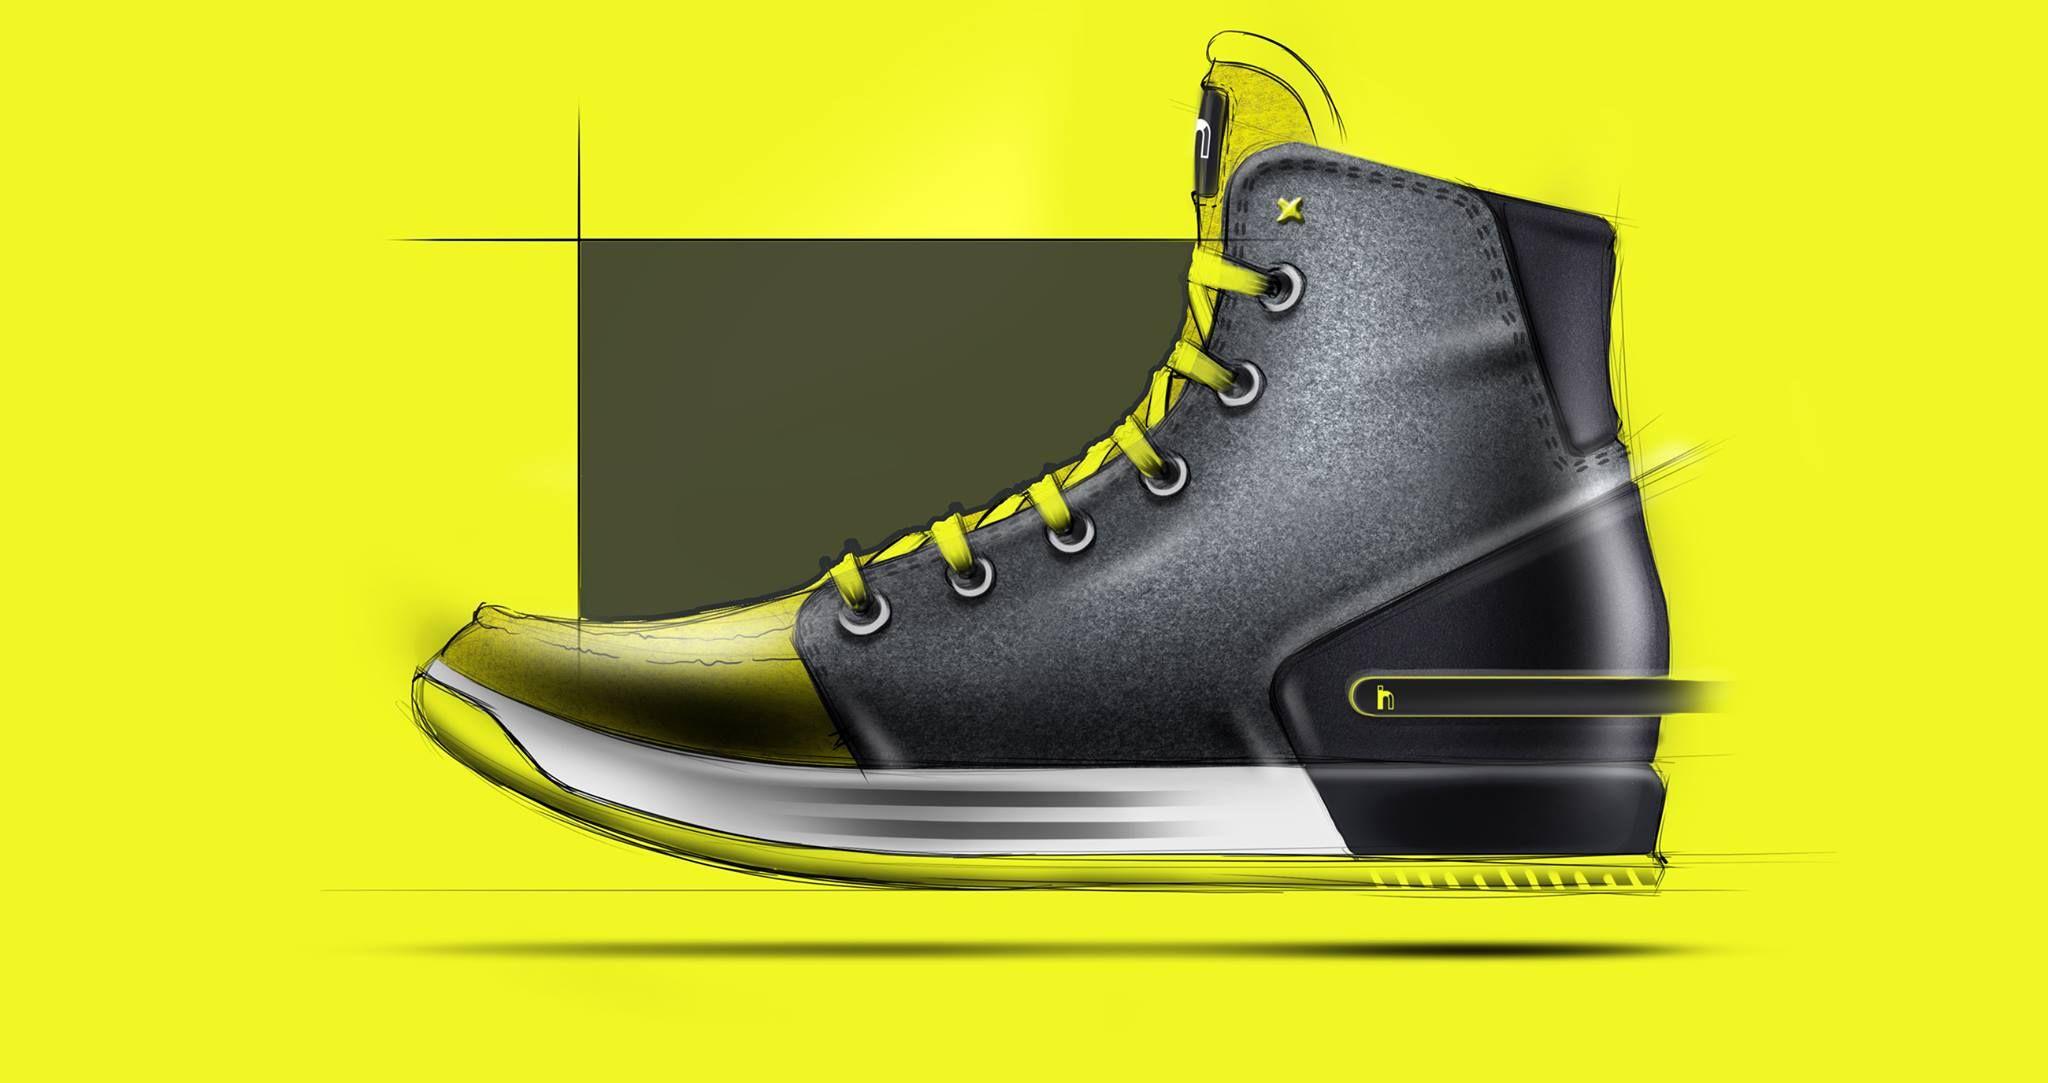 Roshan #Hakkim #Sketch #Bug #Boots #Shoe #Shoes #design